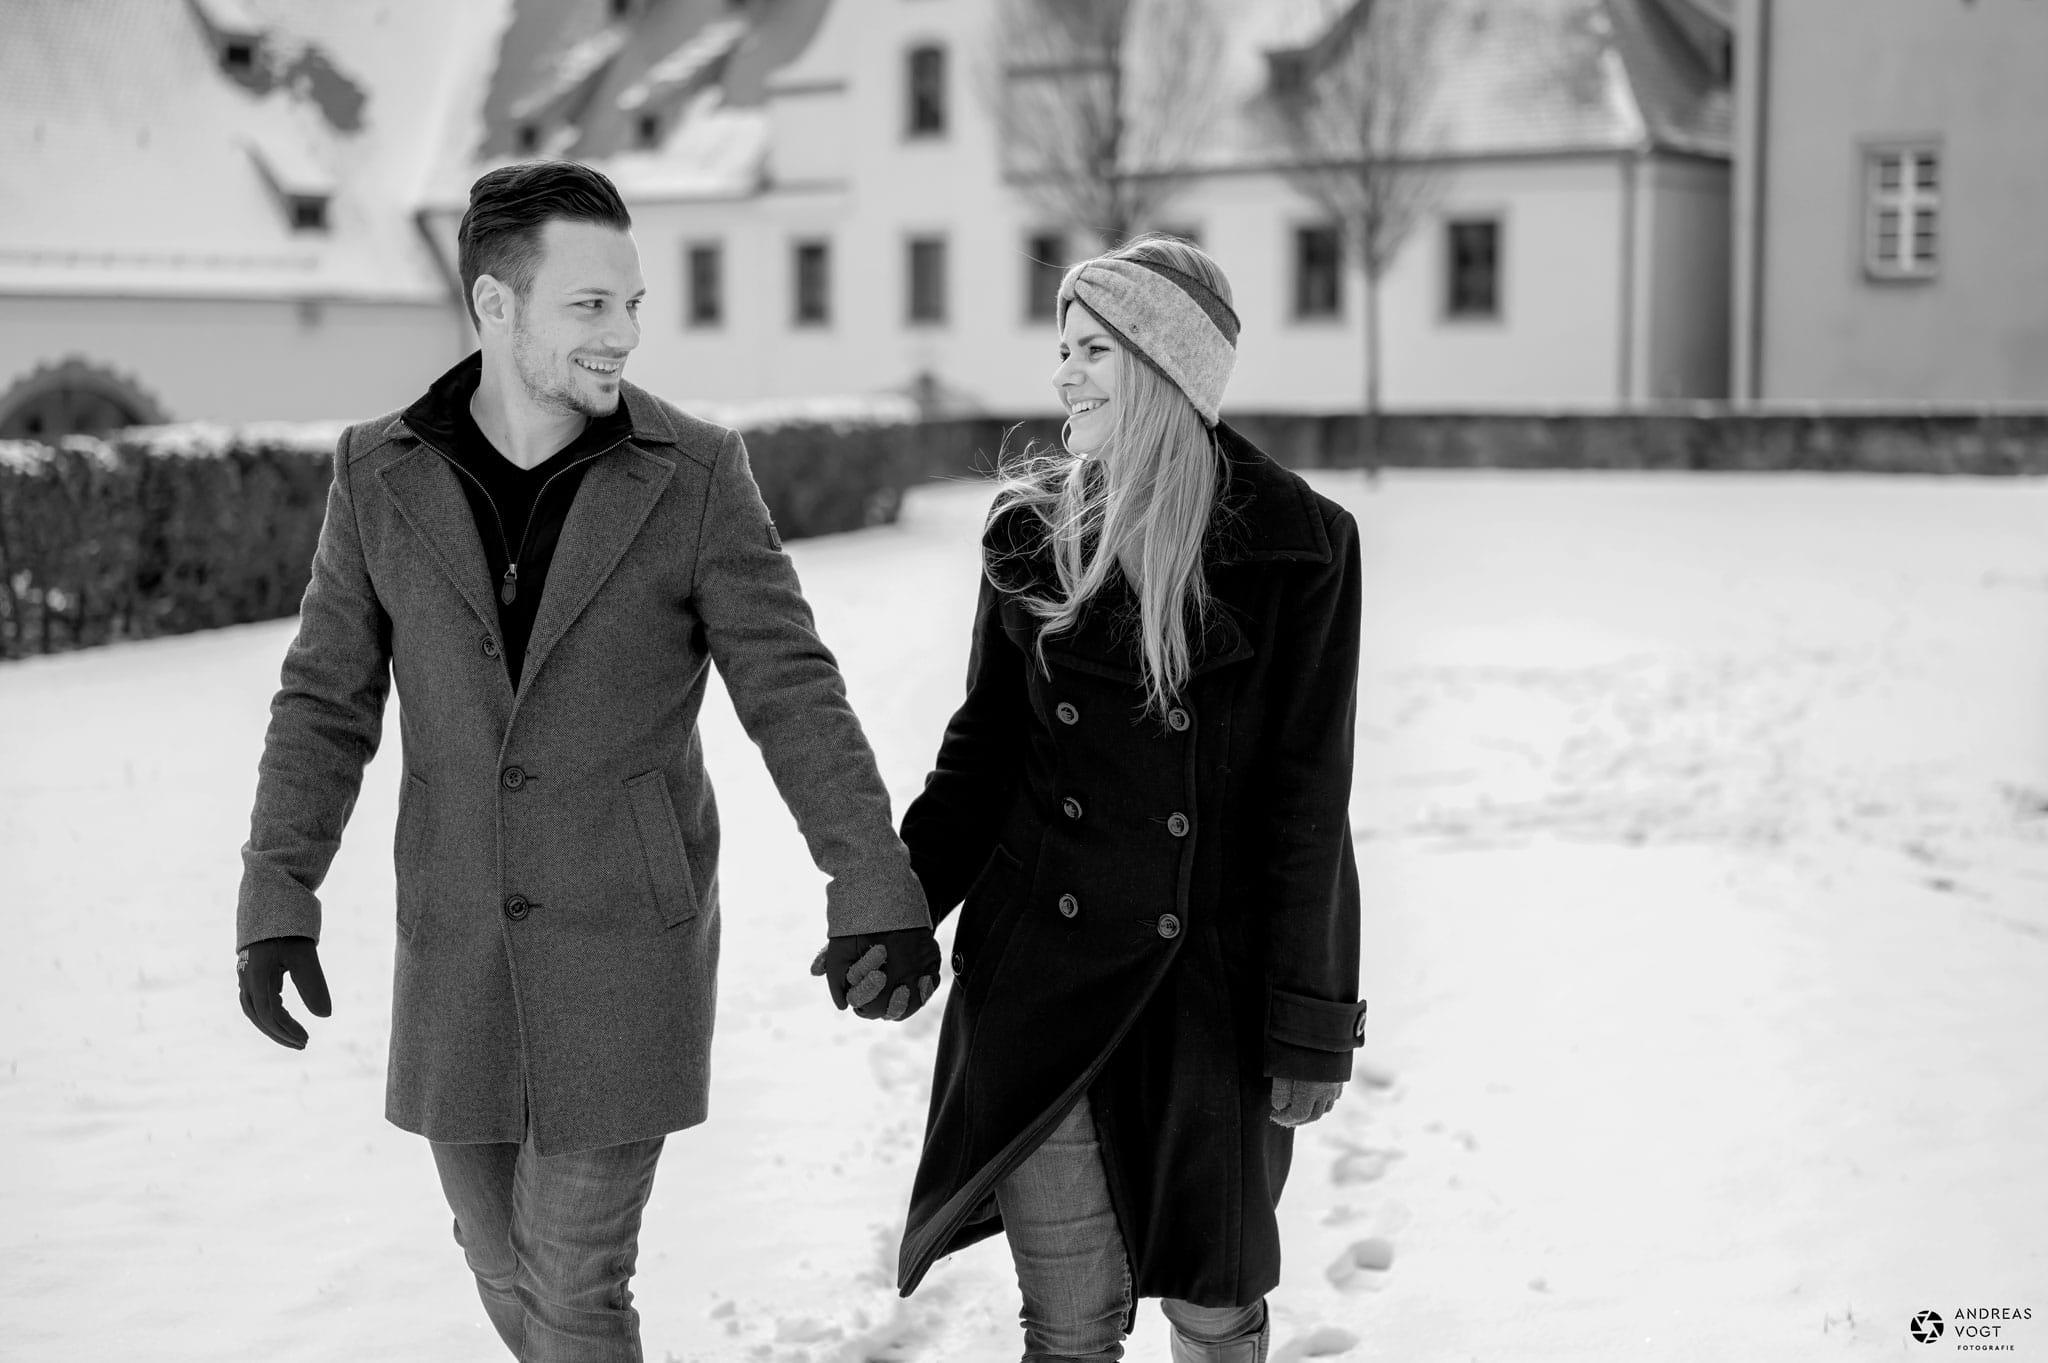 paarfotos-winter-schloss-kapfenburg-12-andreas-vogt-fotograf-aalen